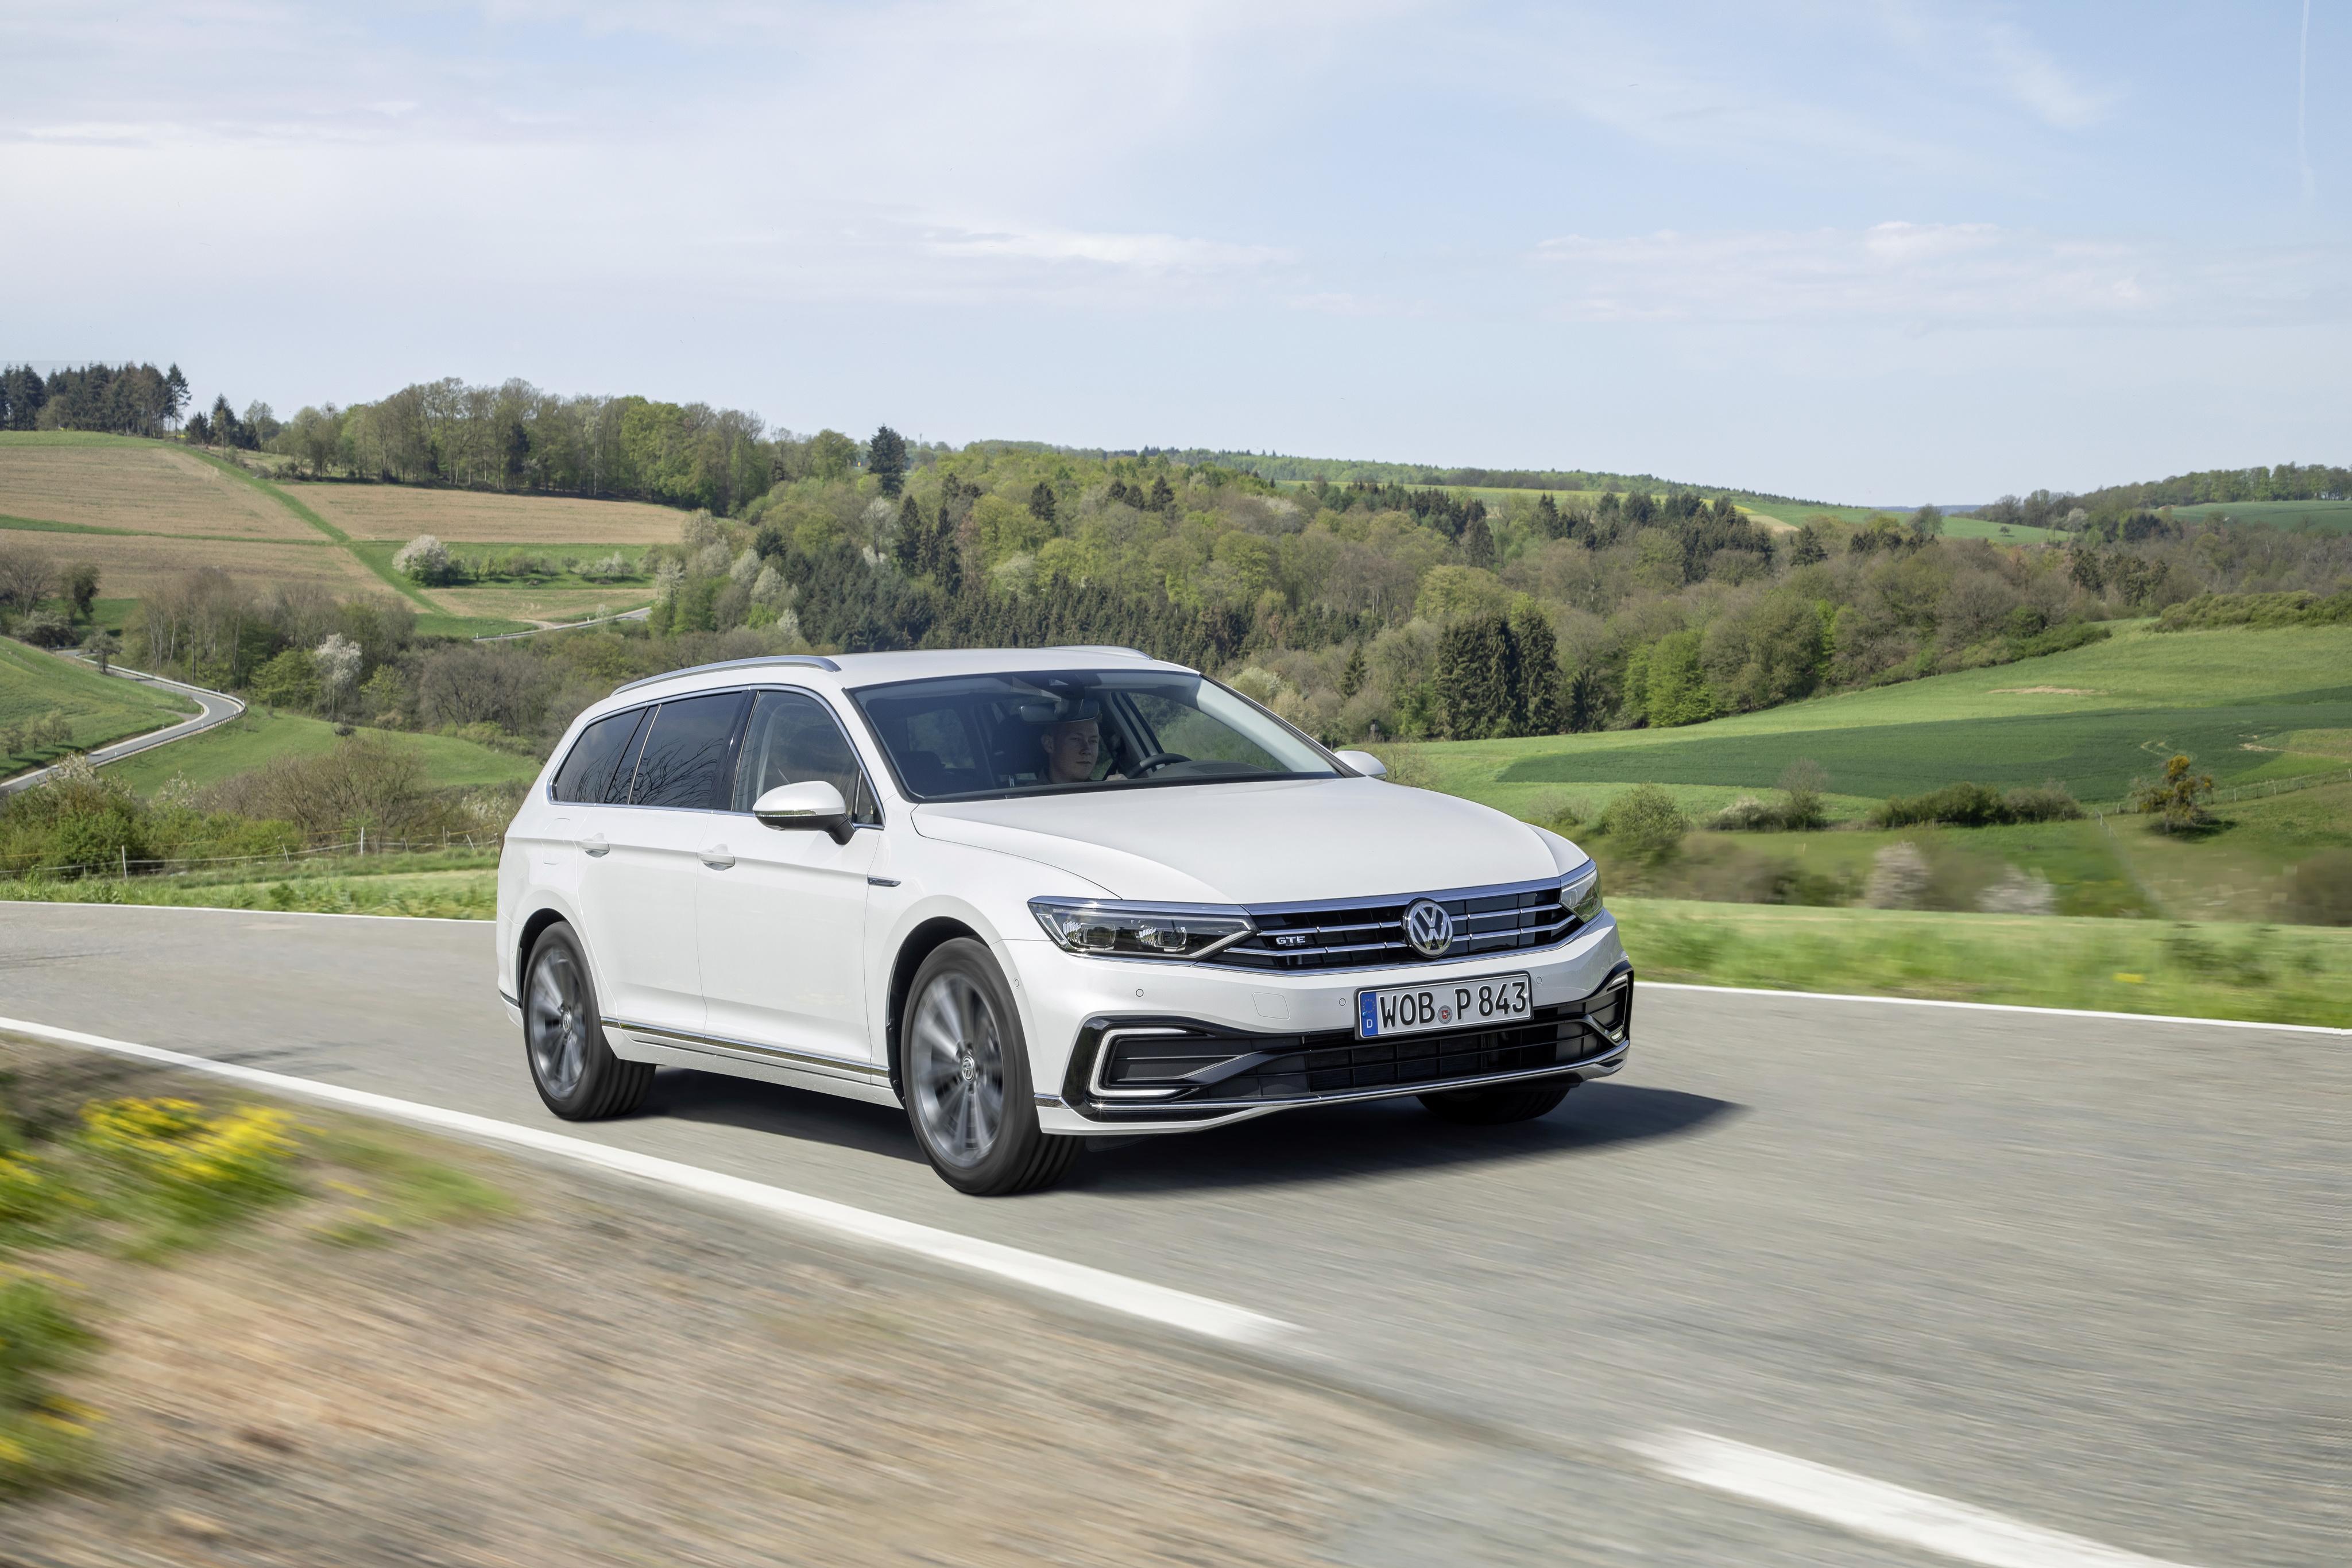 Nuova Volkswagen Passat GTE Variant